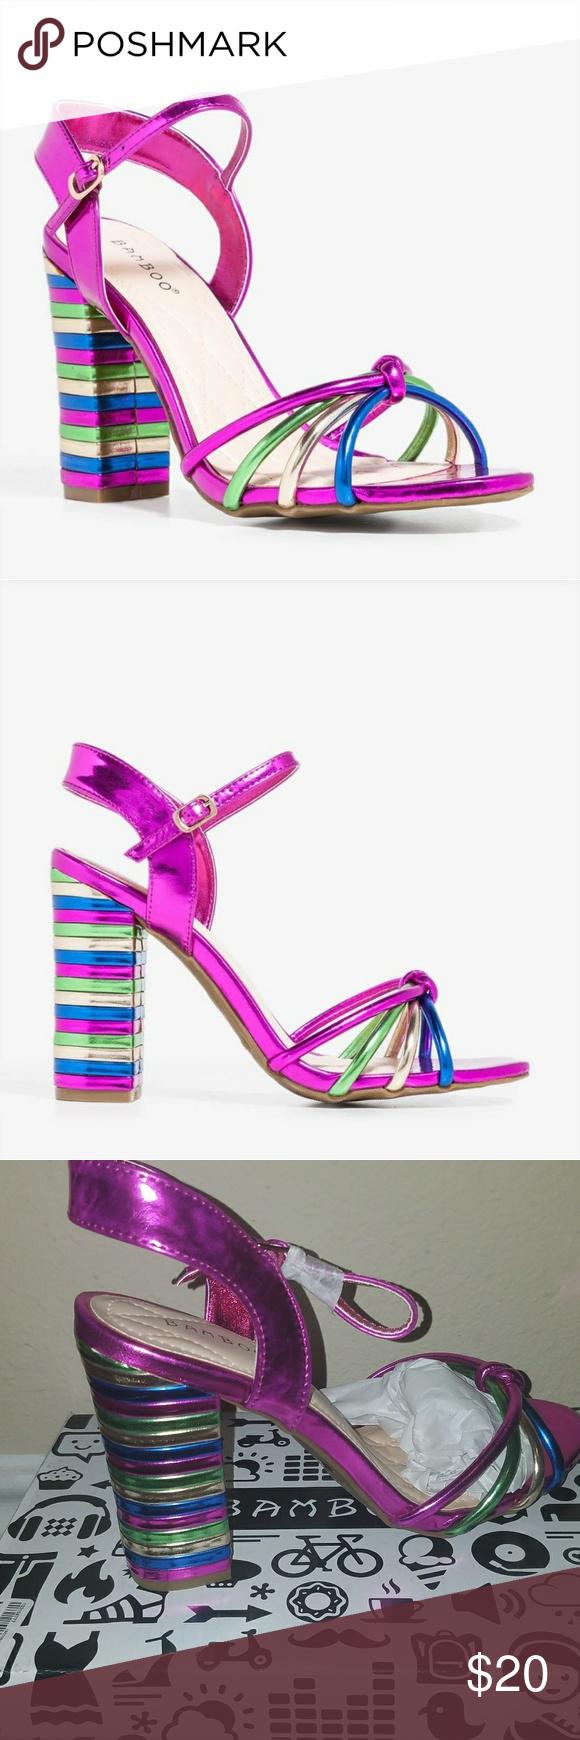 e3e0c430eb6 Bamboo Metallic Rainbow Block Heels Sandals 8 NIB Bamboo Metallic Rainbow  Block Heels Sandals